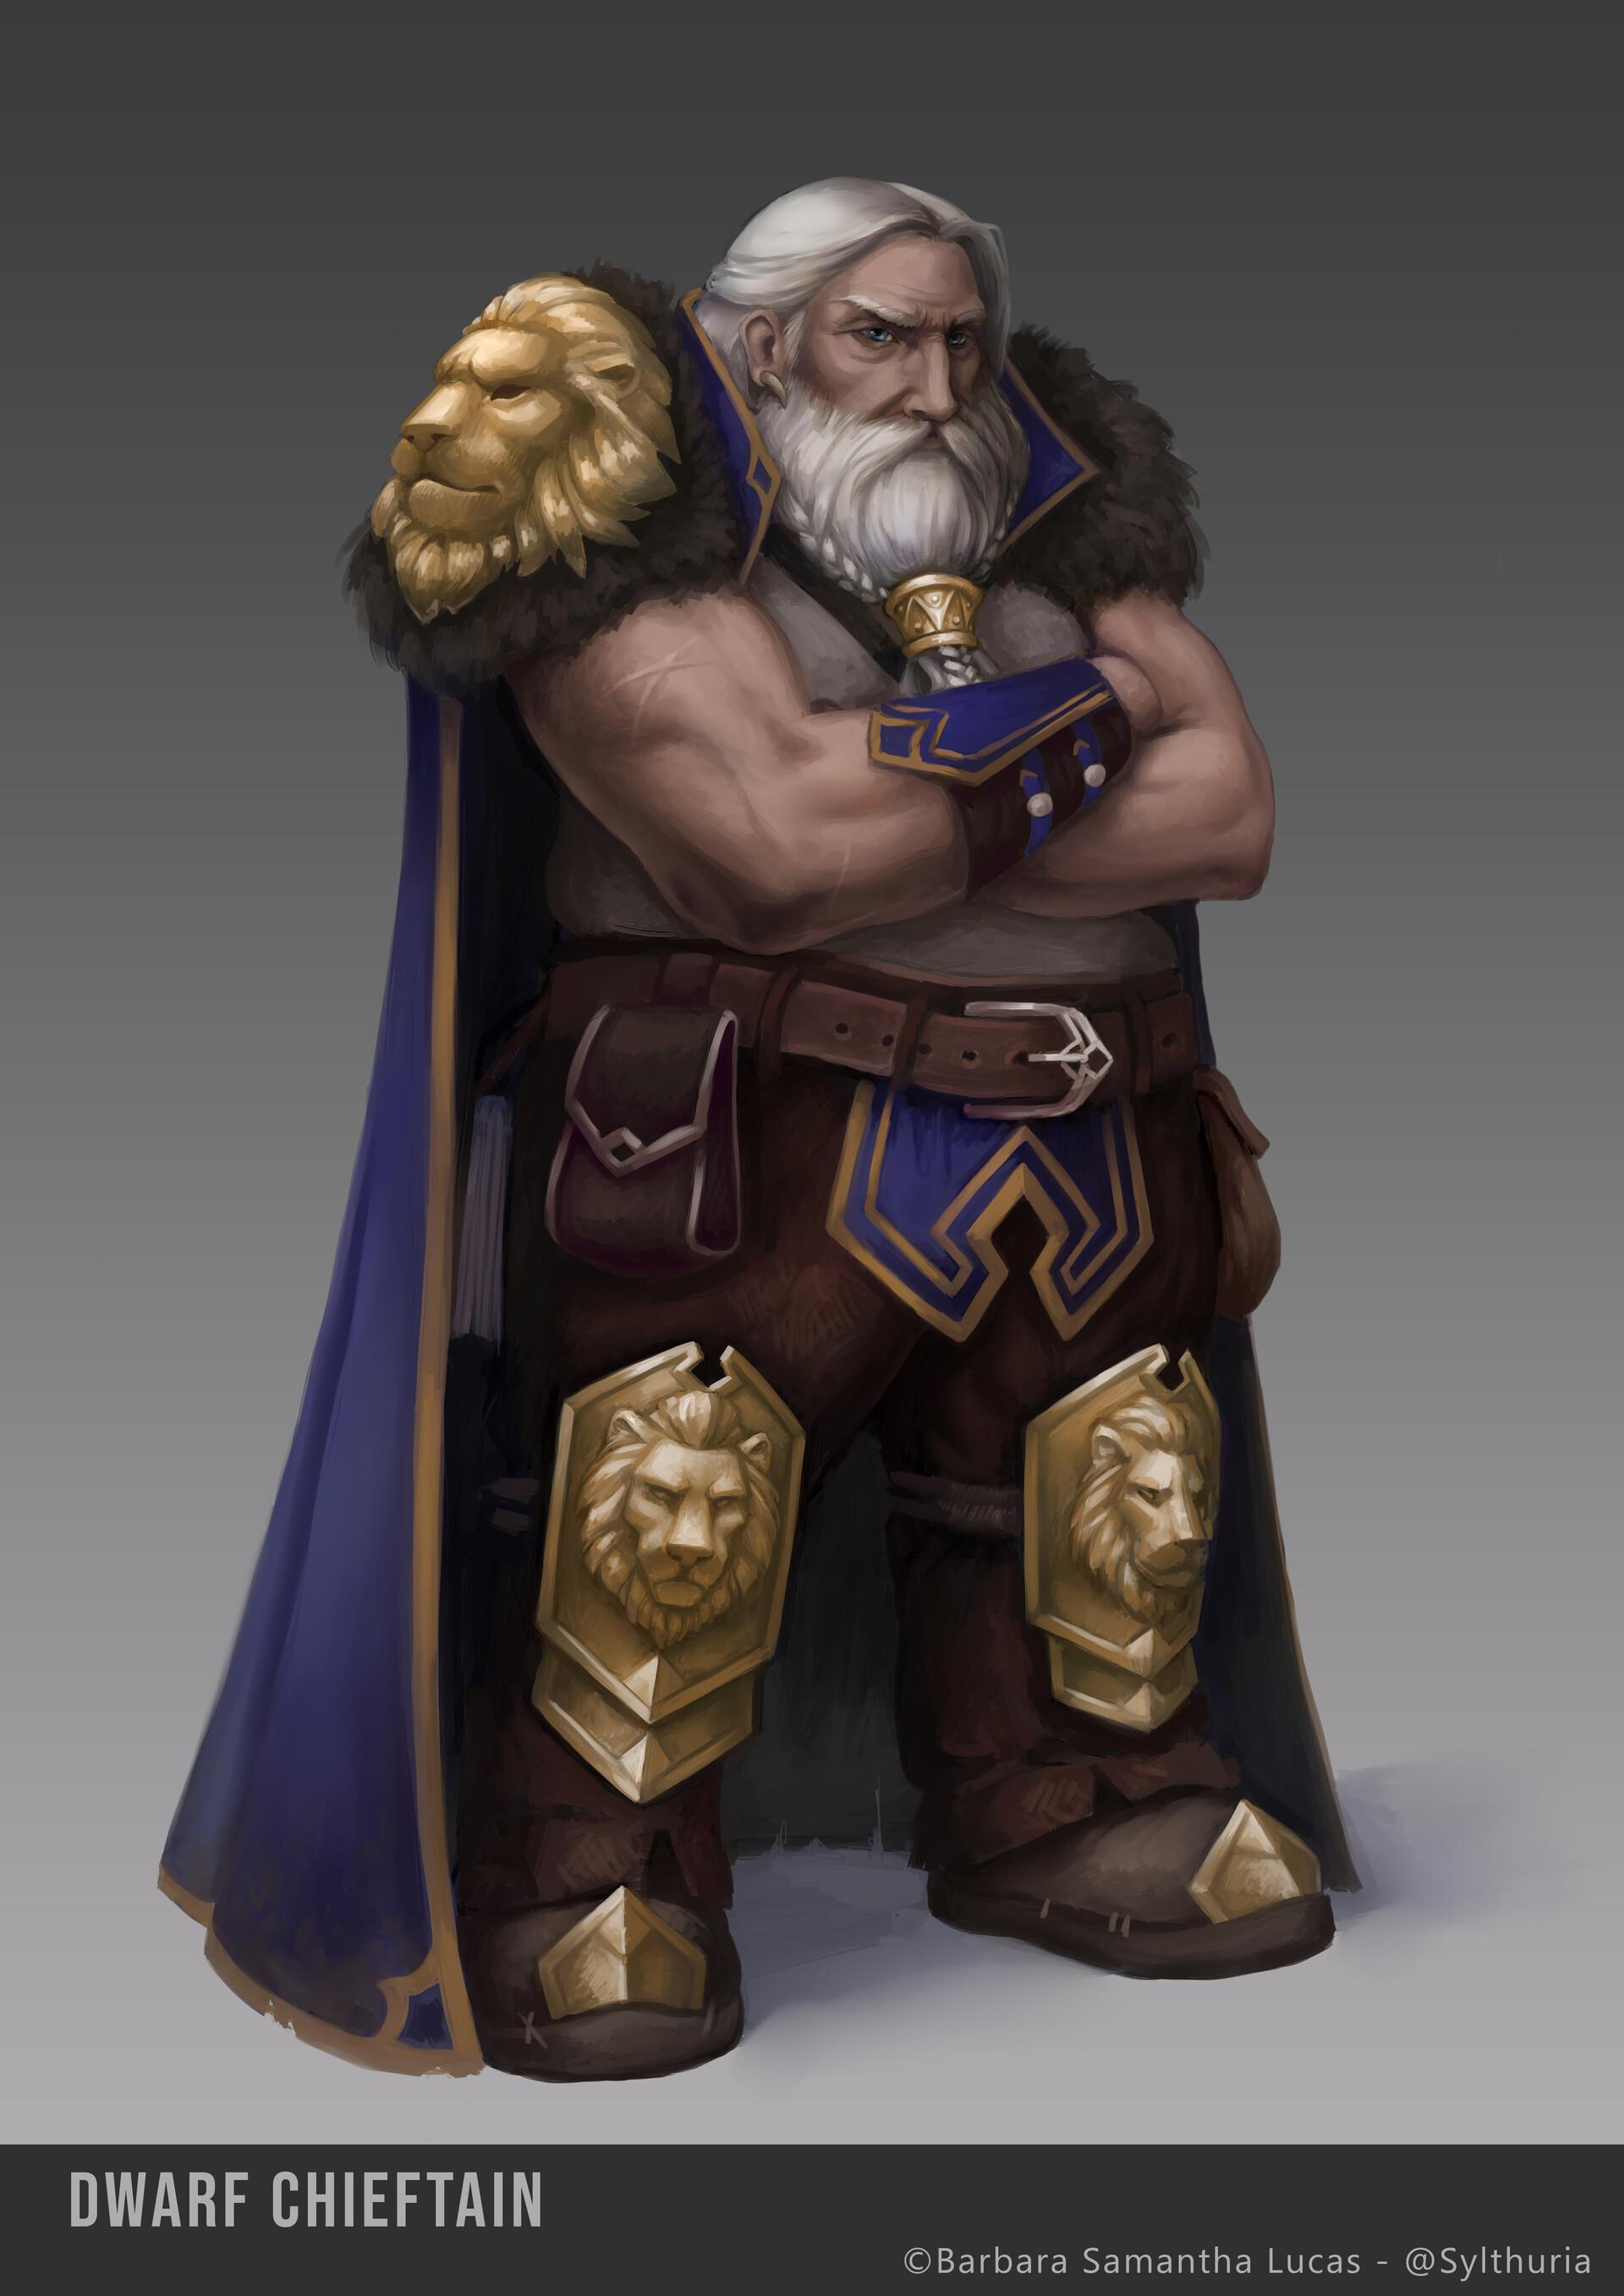 Dwarf - Character design